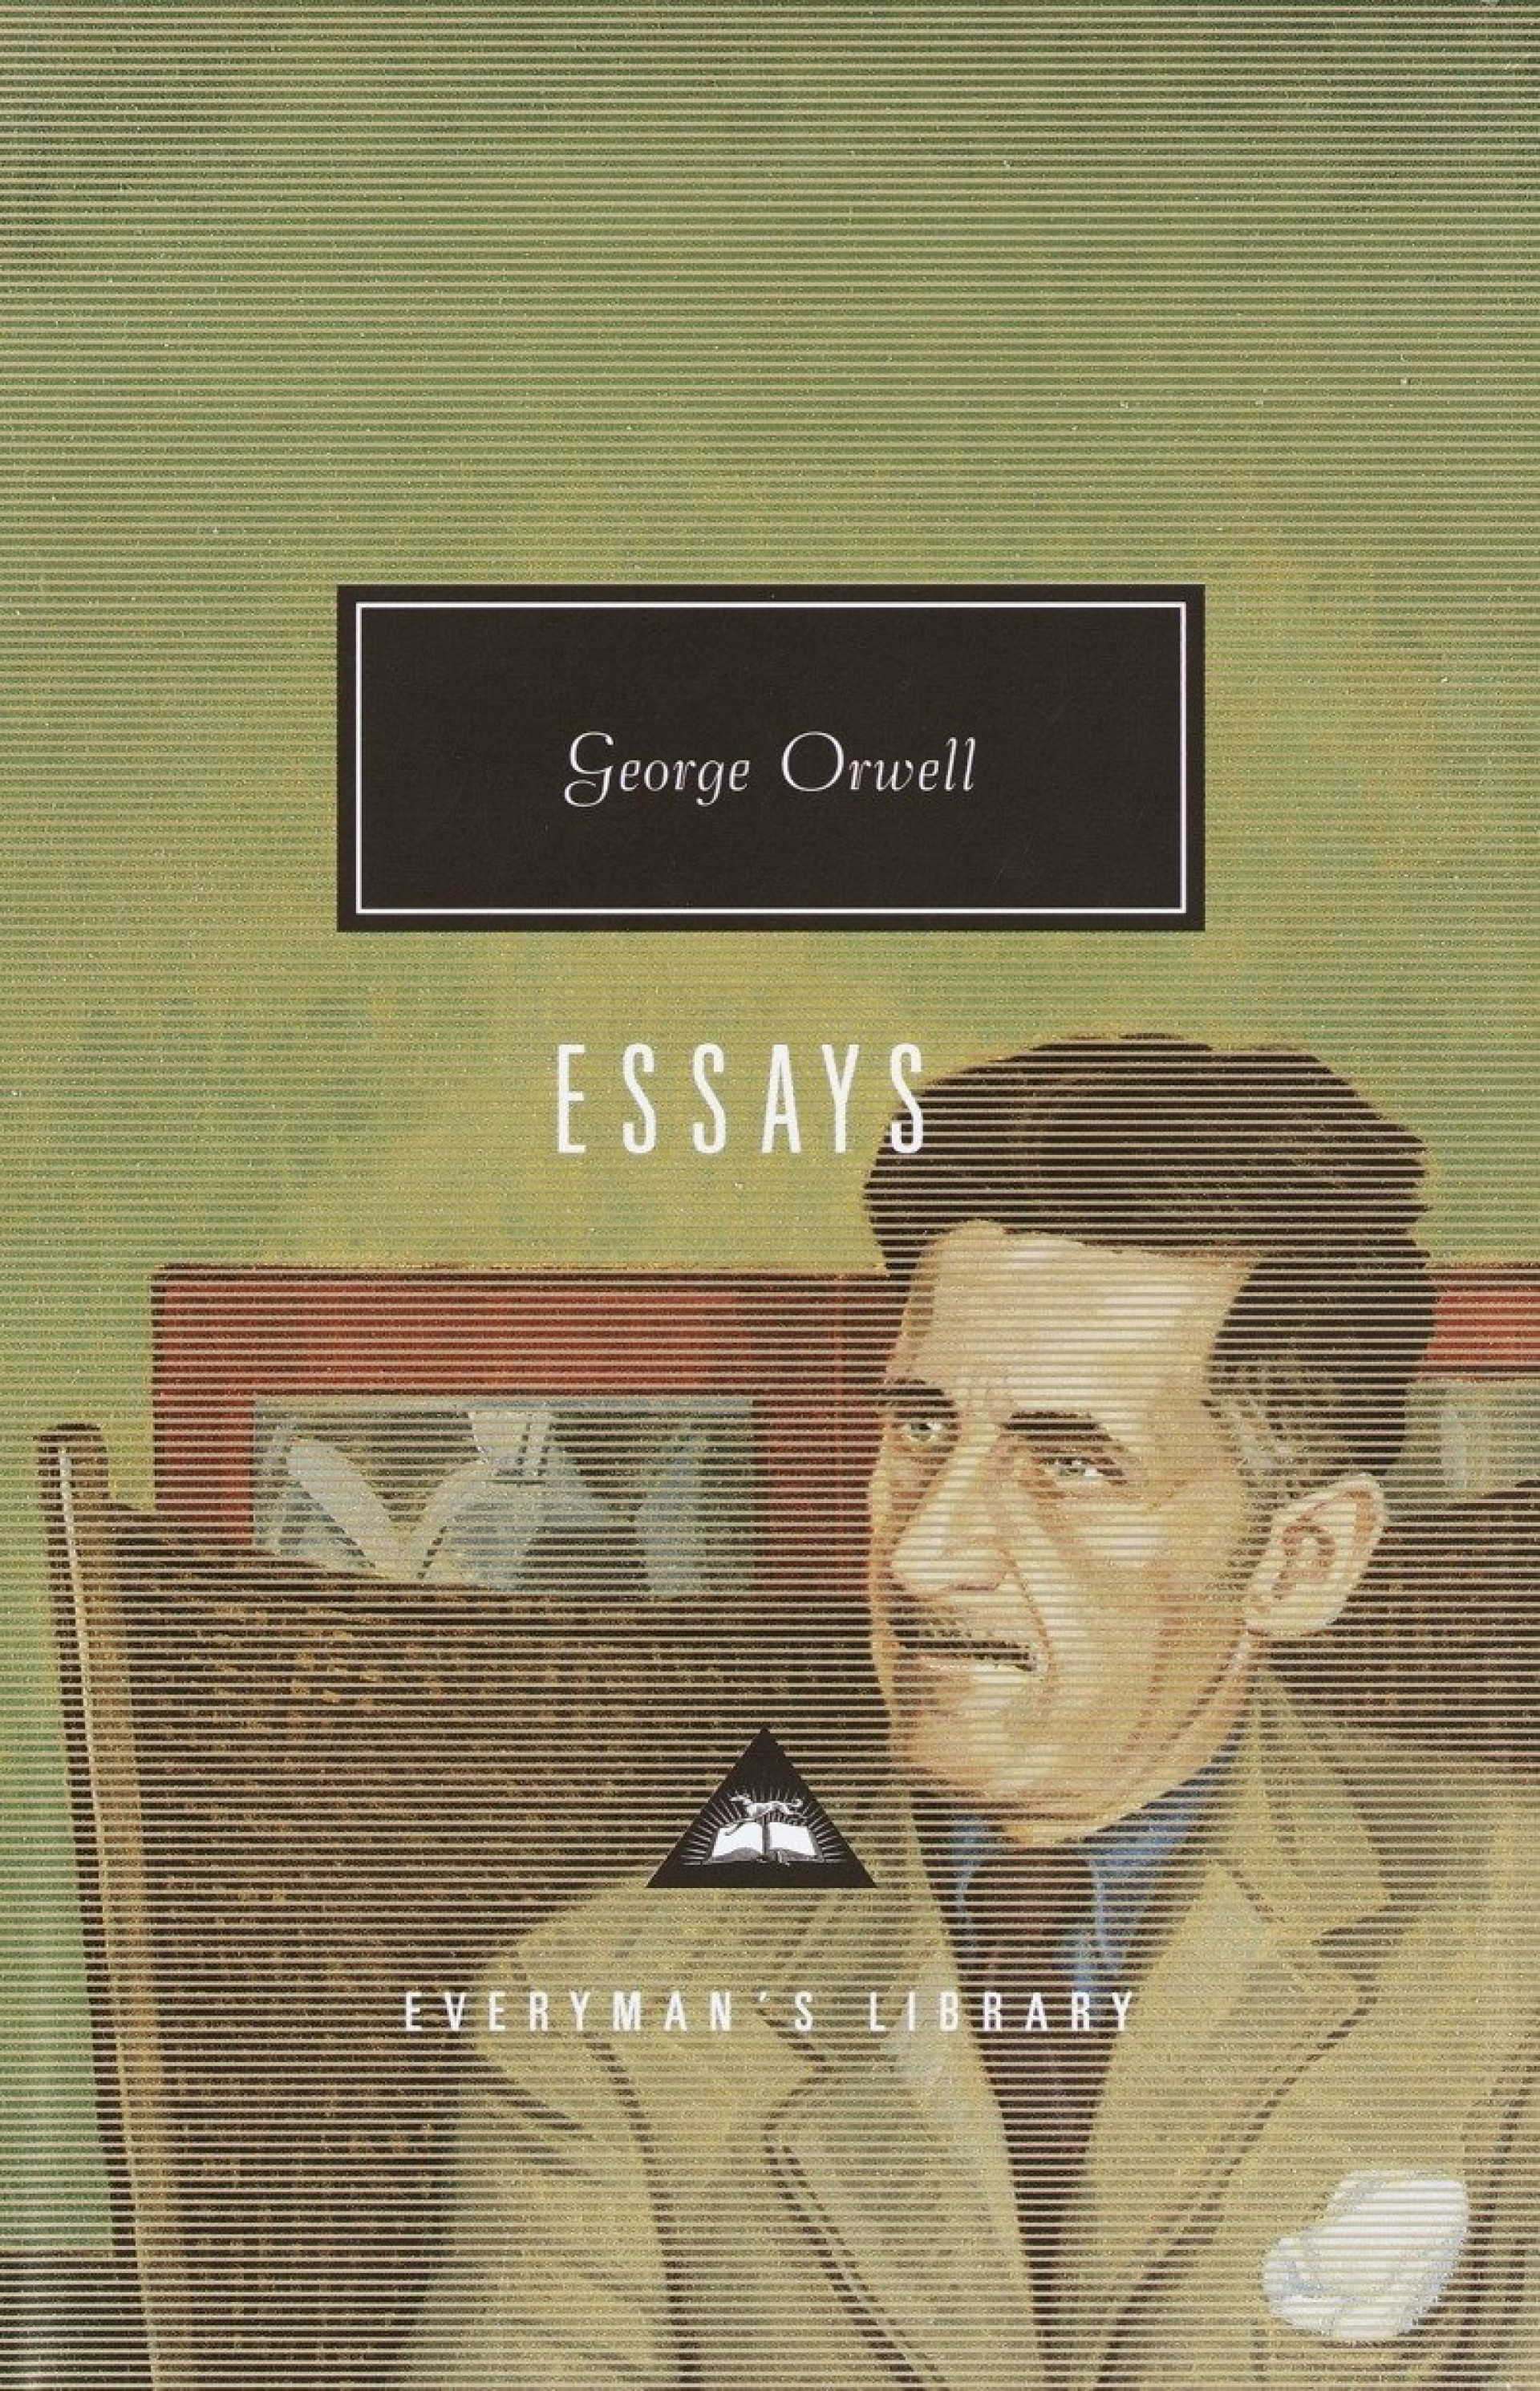 006 81qzb0g1zol Essay Example George Orwell Frightening Essays 1984 Summary Collected Pdf On Writing 1920